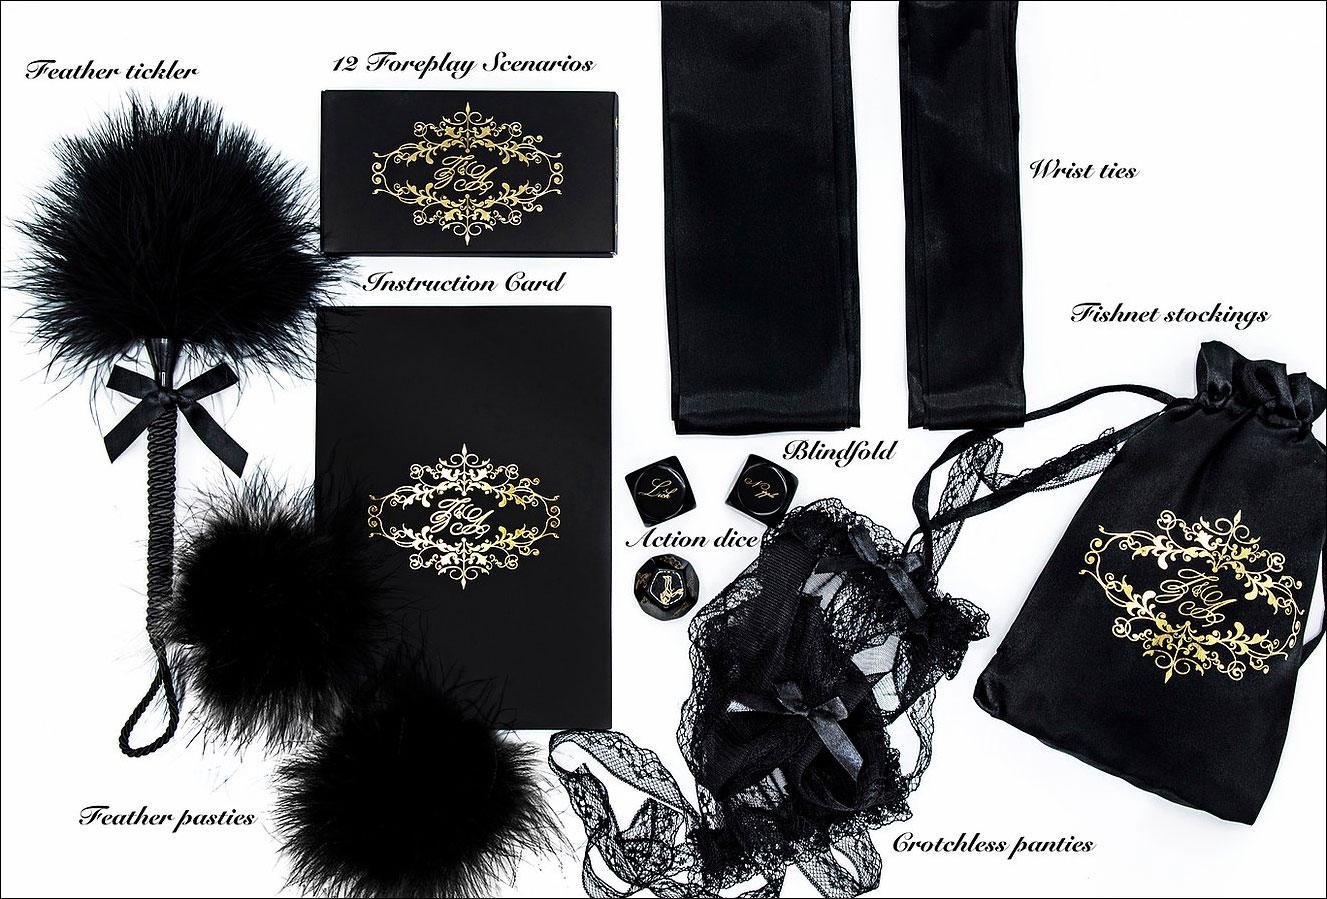 Zoe & Alexandra Midnight Enchantress Romantic Accessory Boudoir Box - What's Inside?